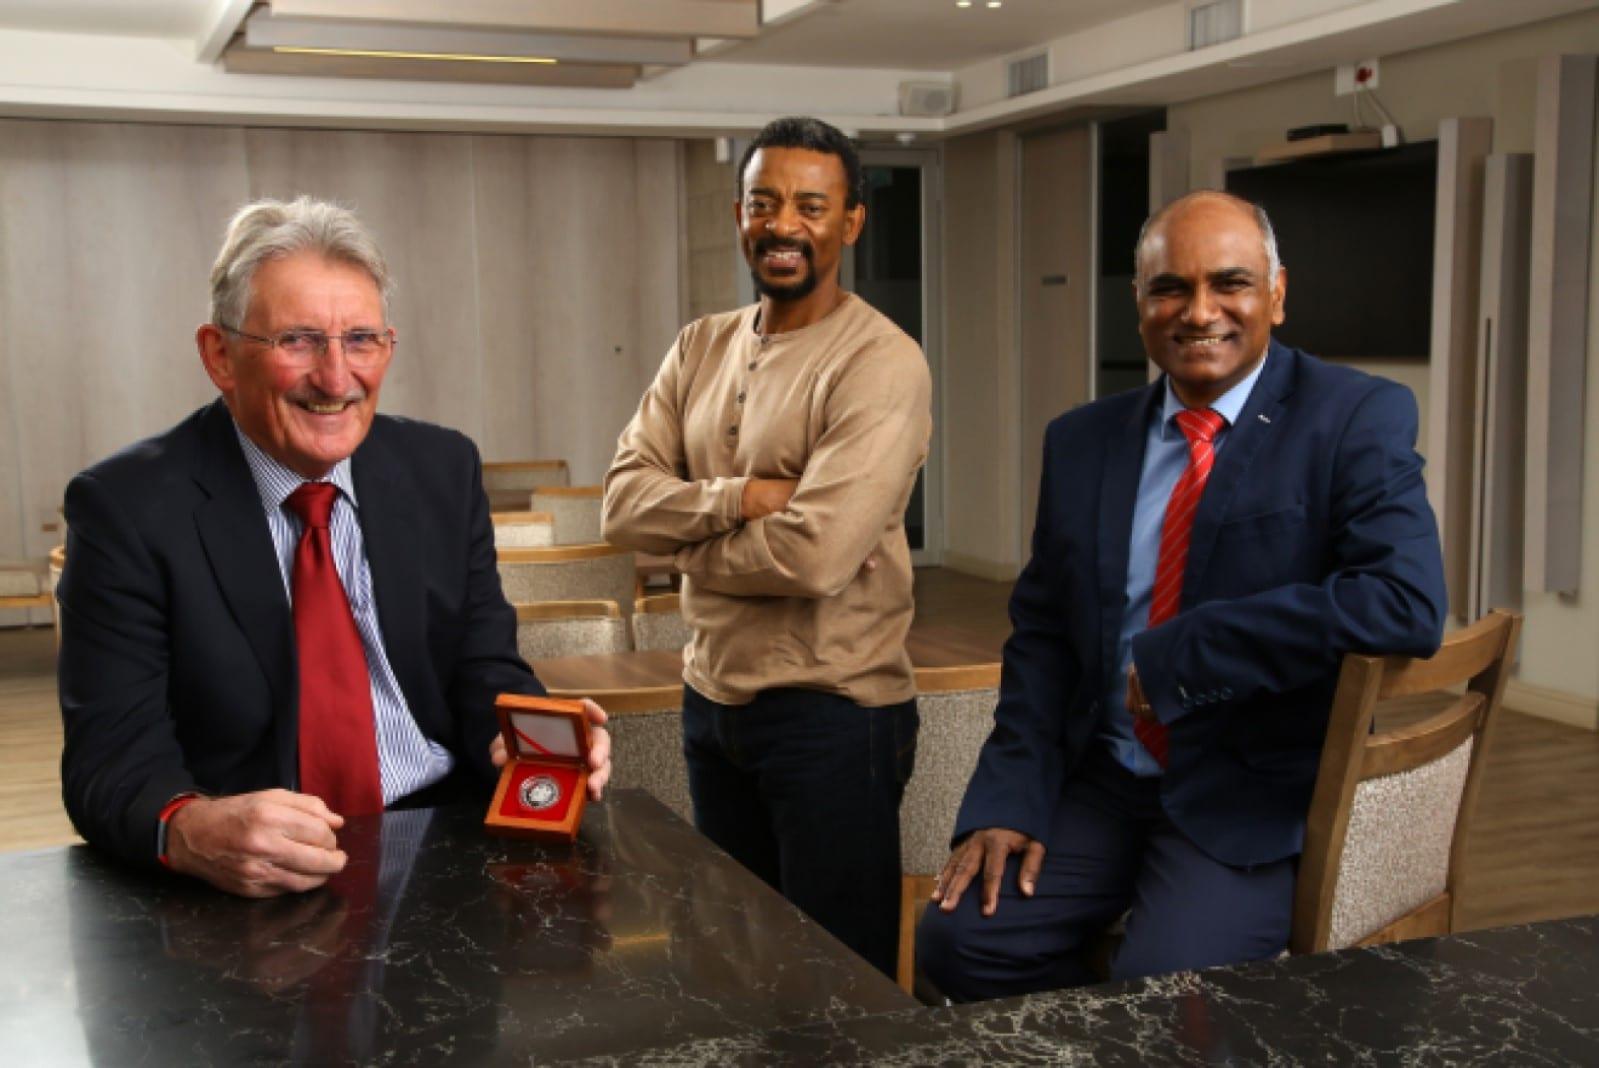 Roger Dixon awarded with Brigadier Stokes award